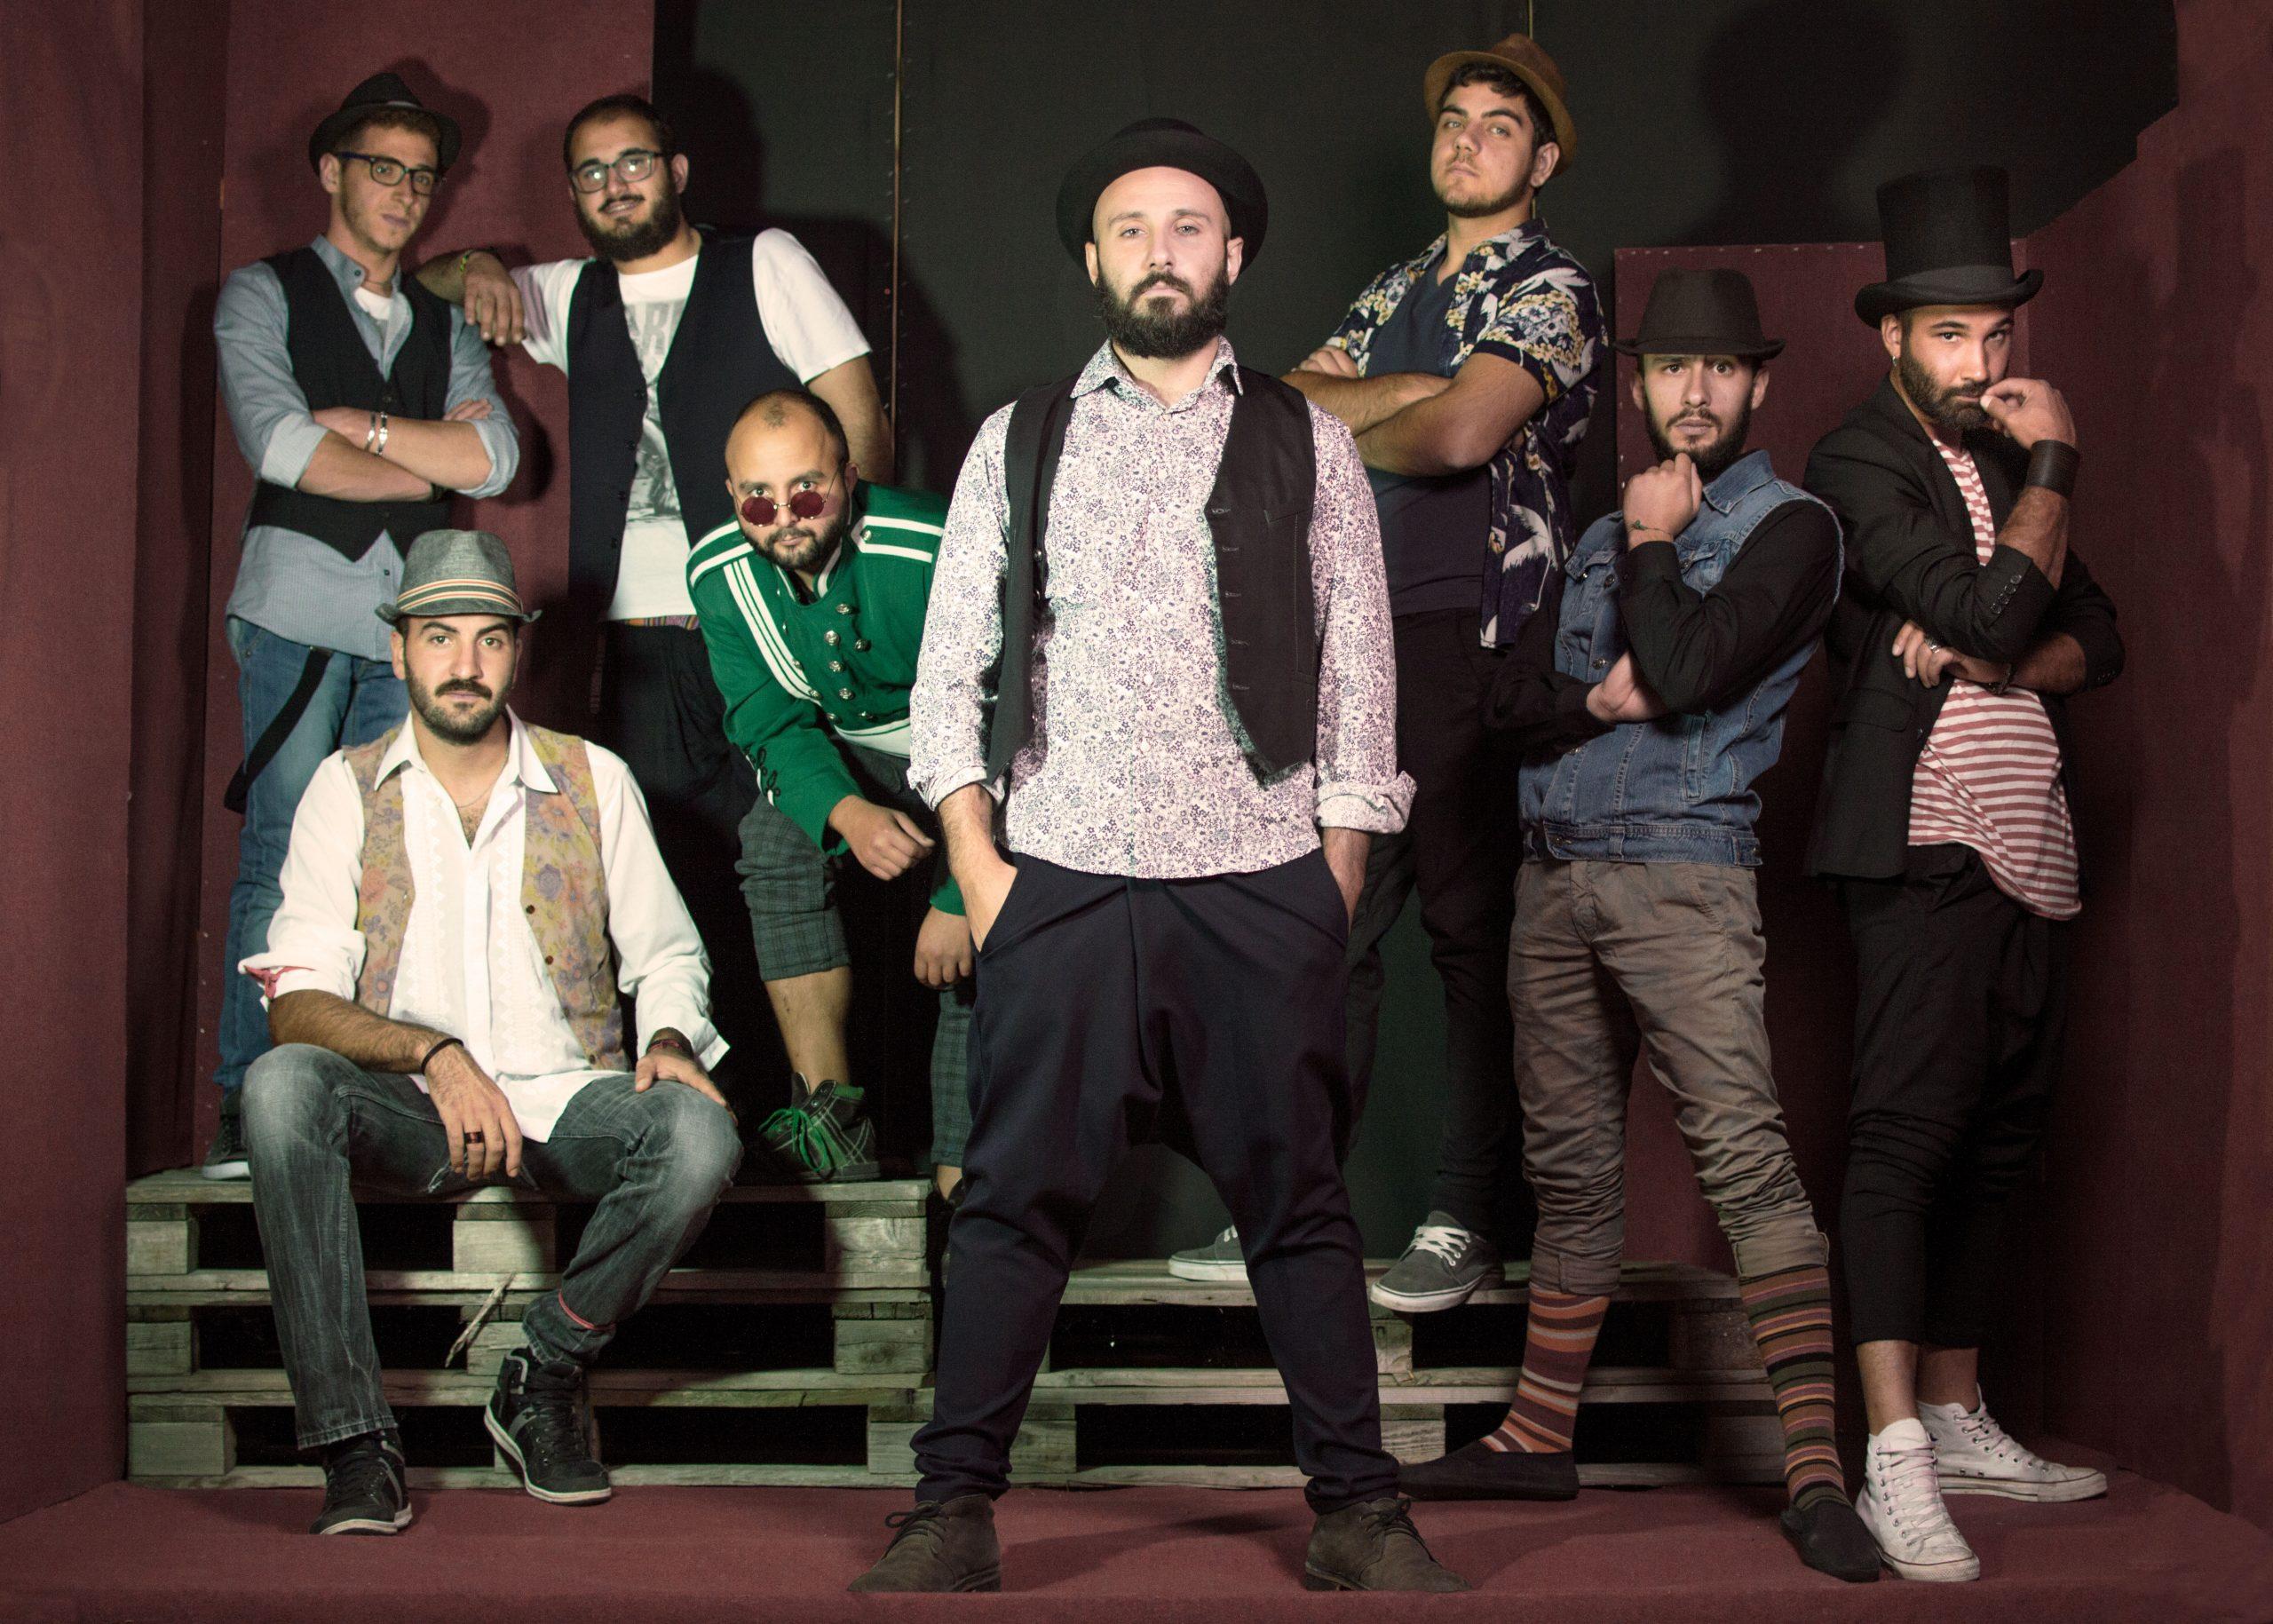 Cicciuzzi | Ska, Reggae, World Music from Sicily (IT)